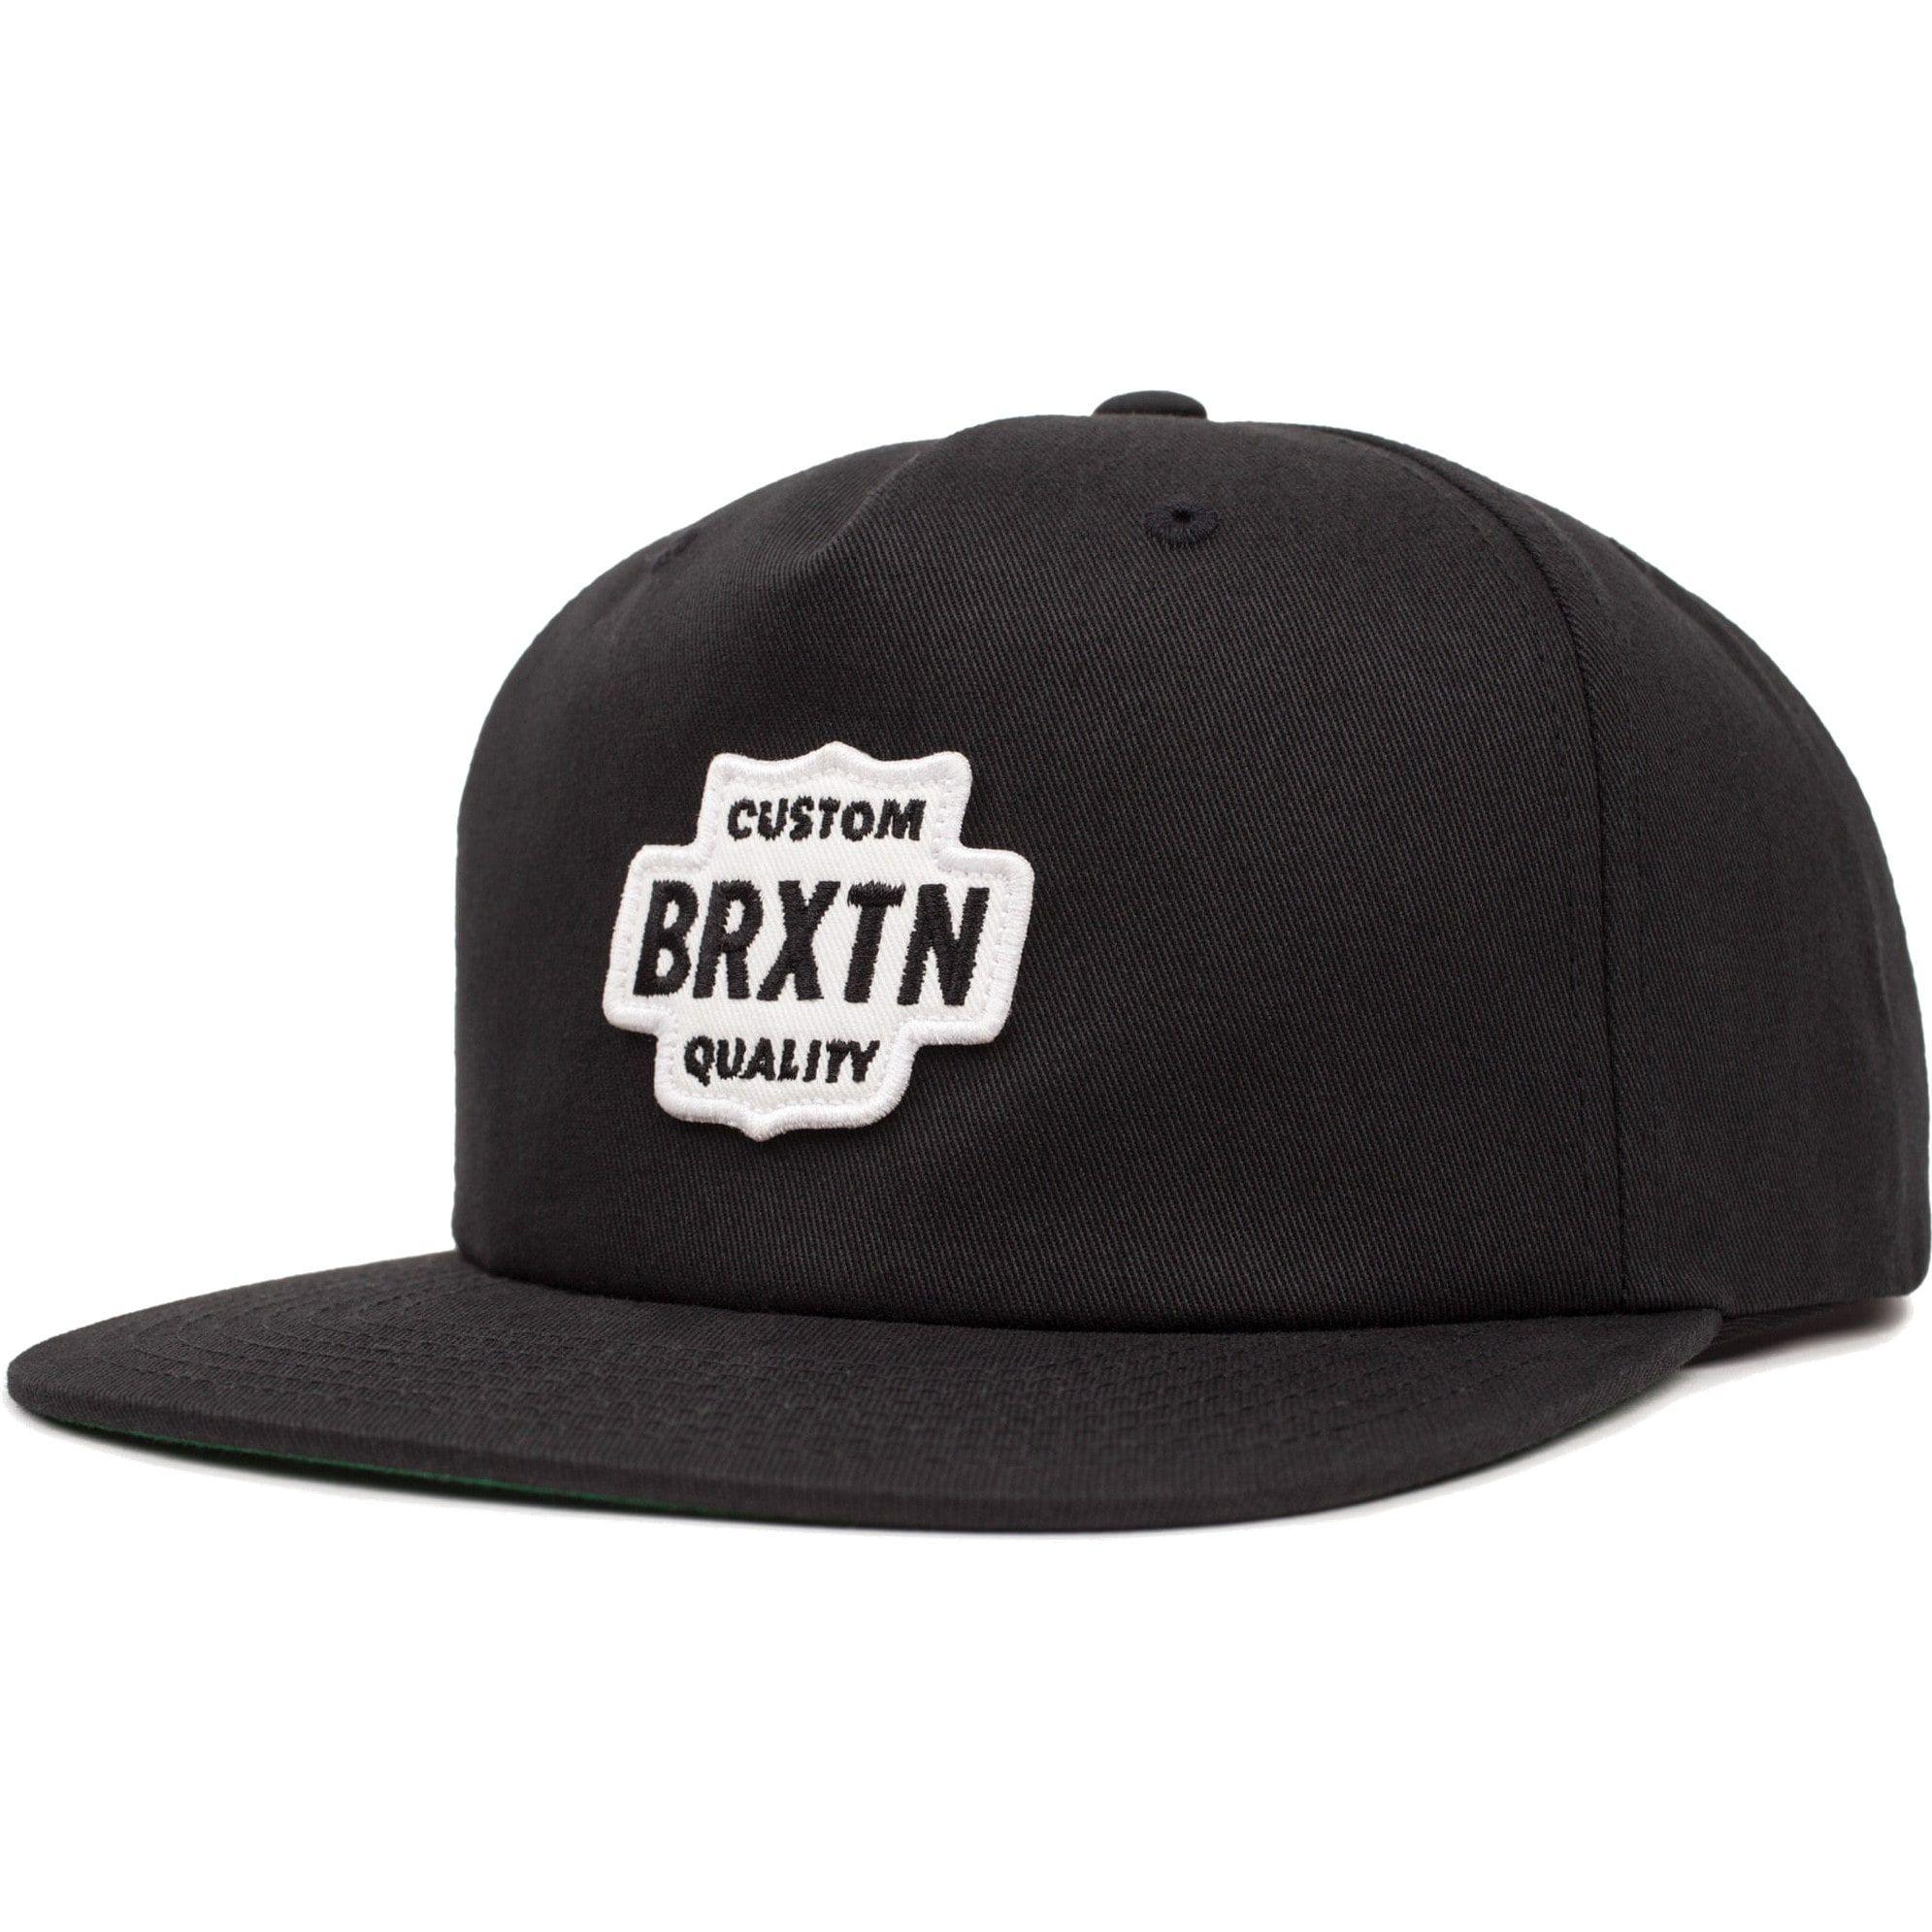 4168b0539 Brixton Garth Cap - Black/White in 2019 | CLOTH | Brixton, Baseball ...